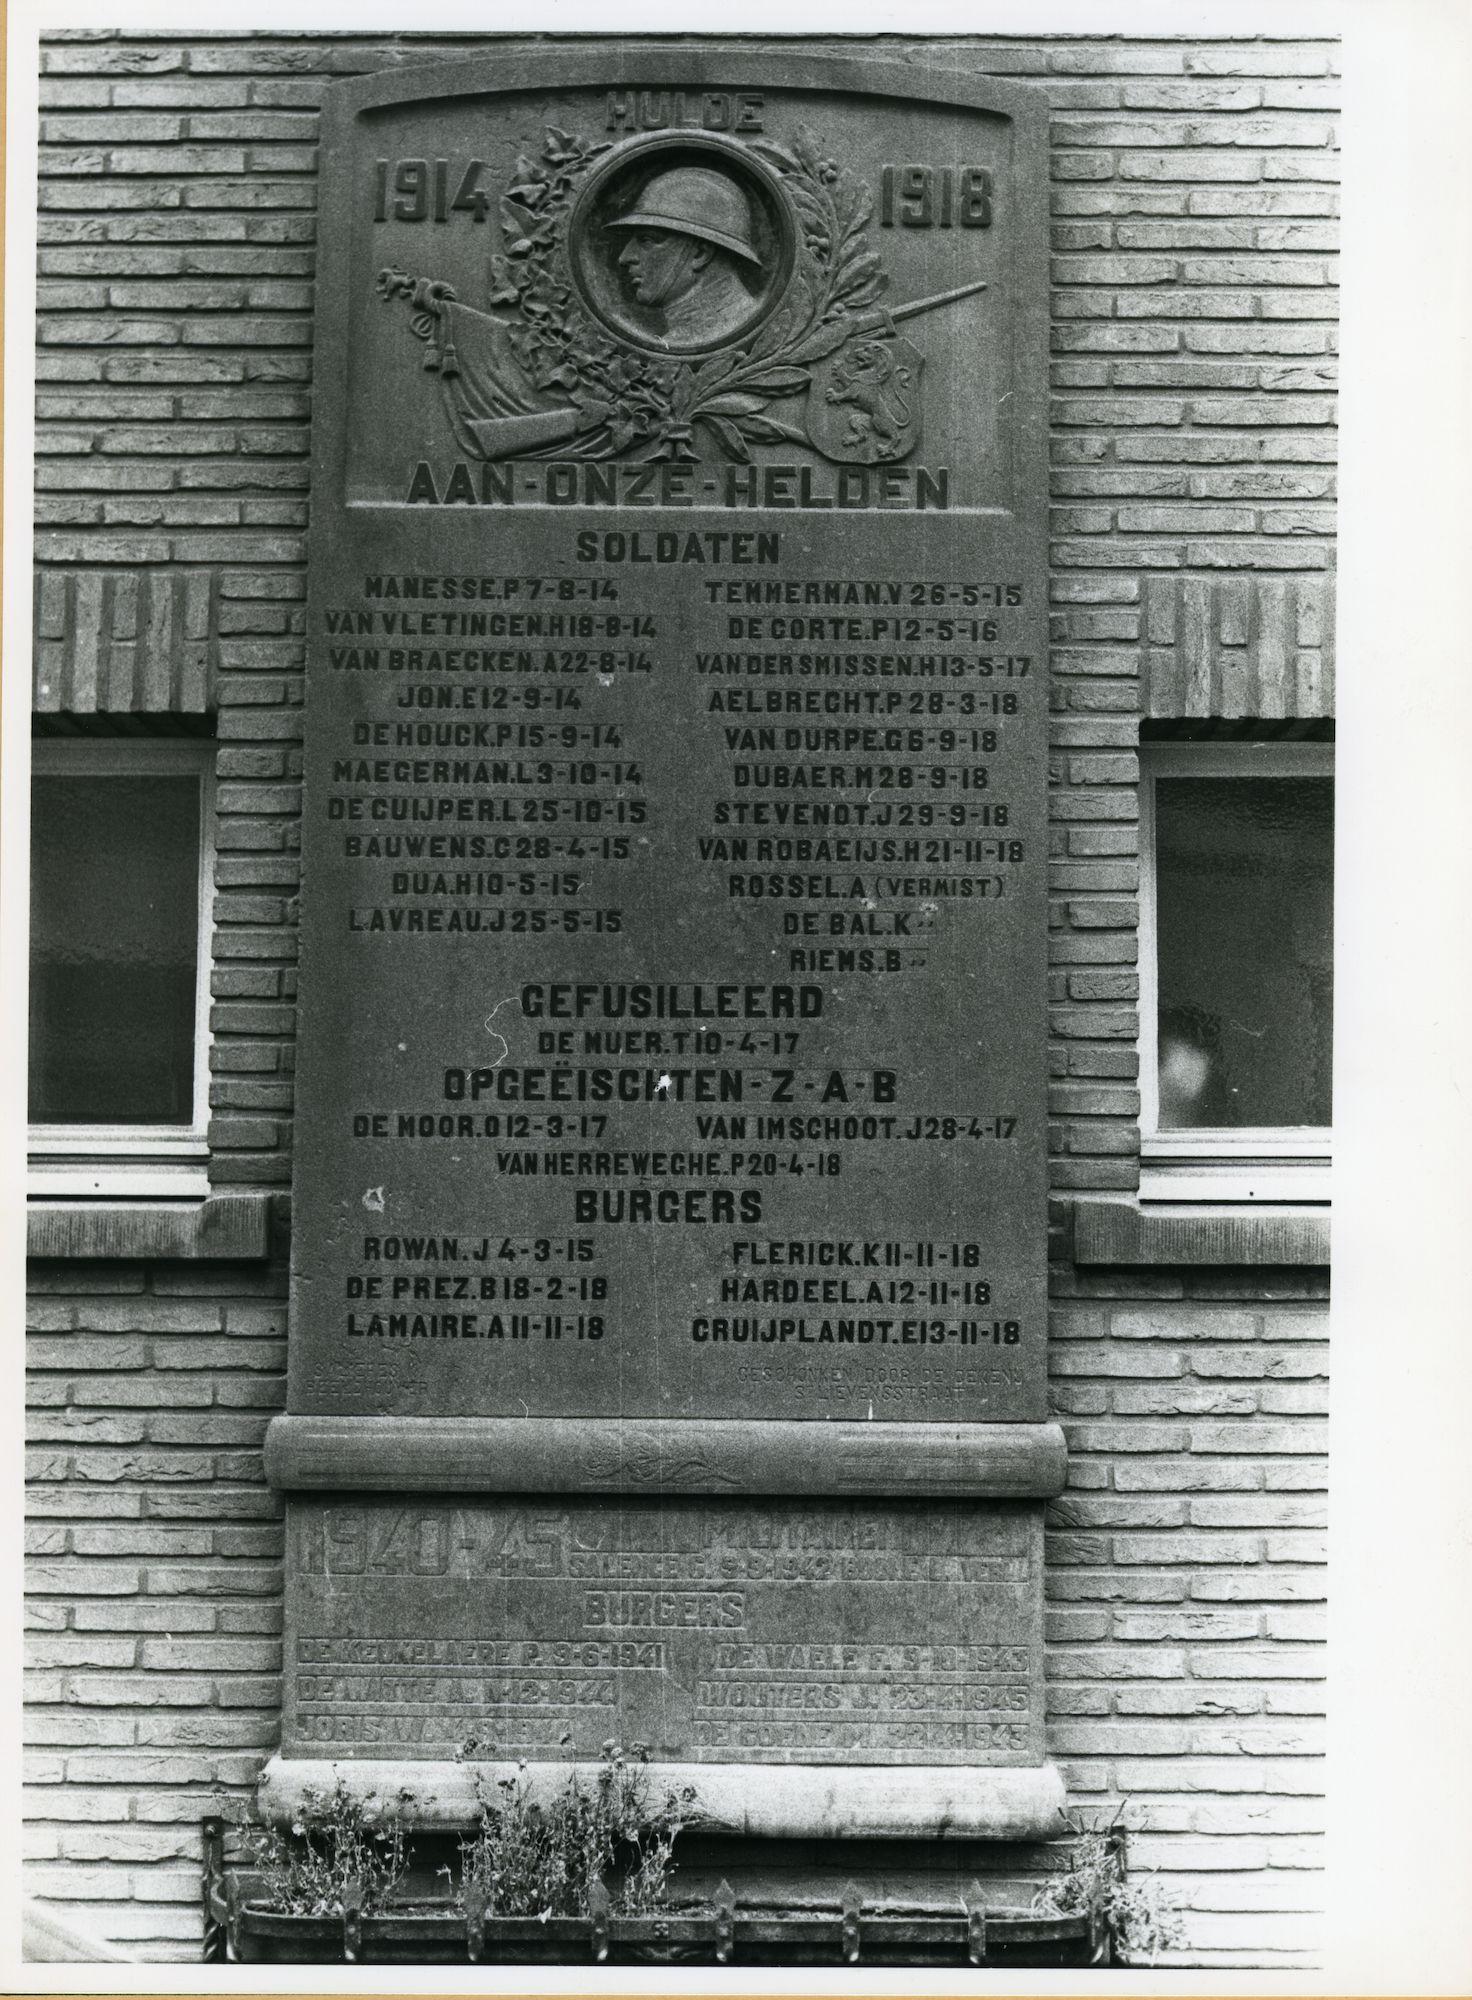 Gent: Sint Lievenspoortstraat 129: oorlogsgedenkplaat, 1979